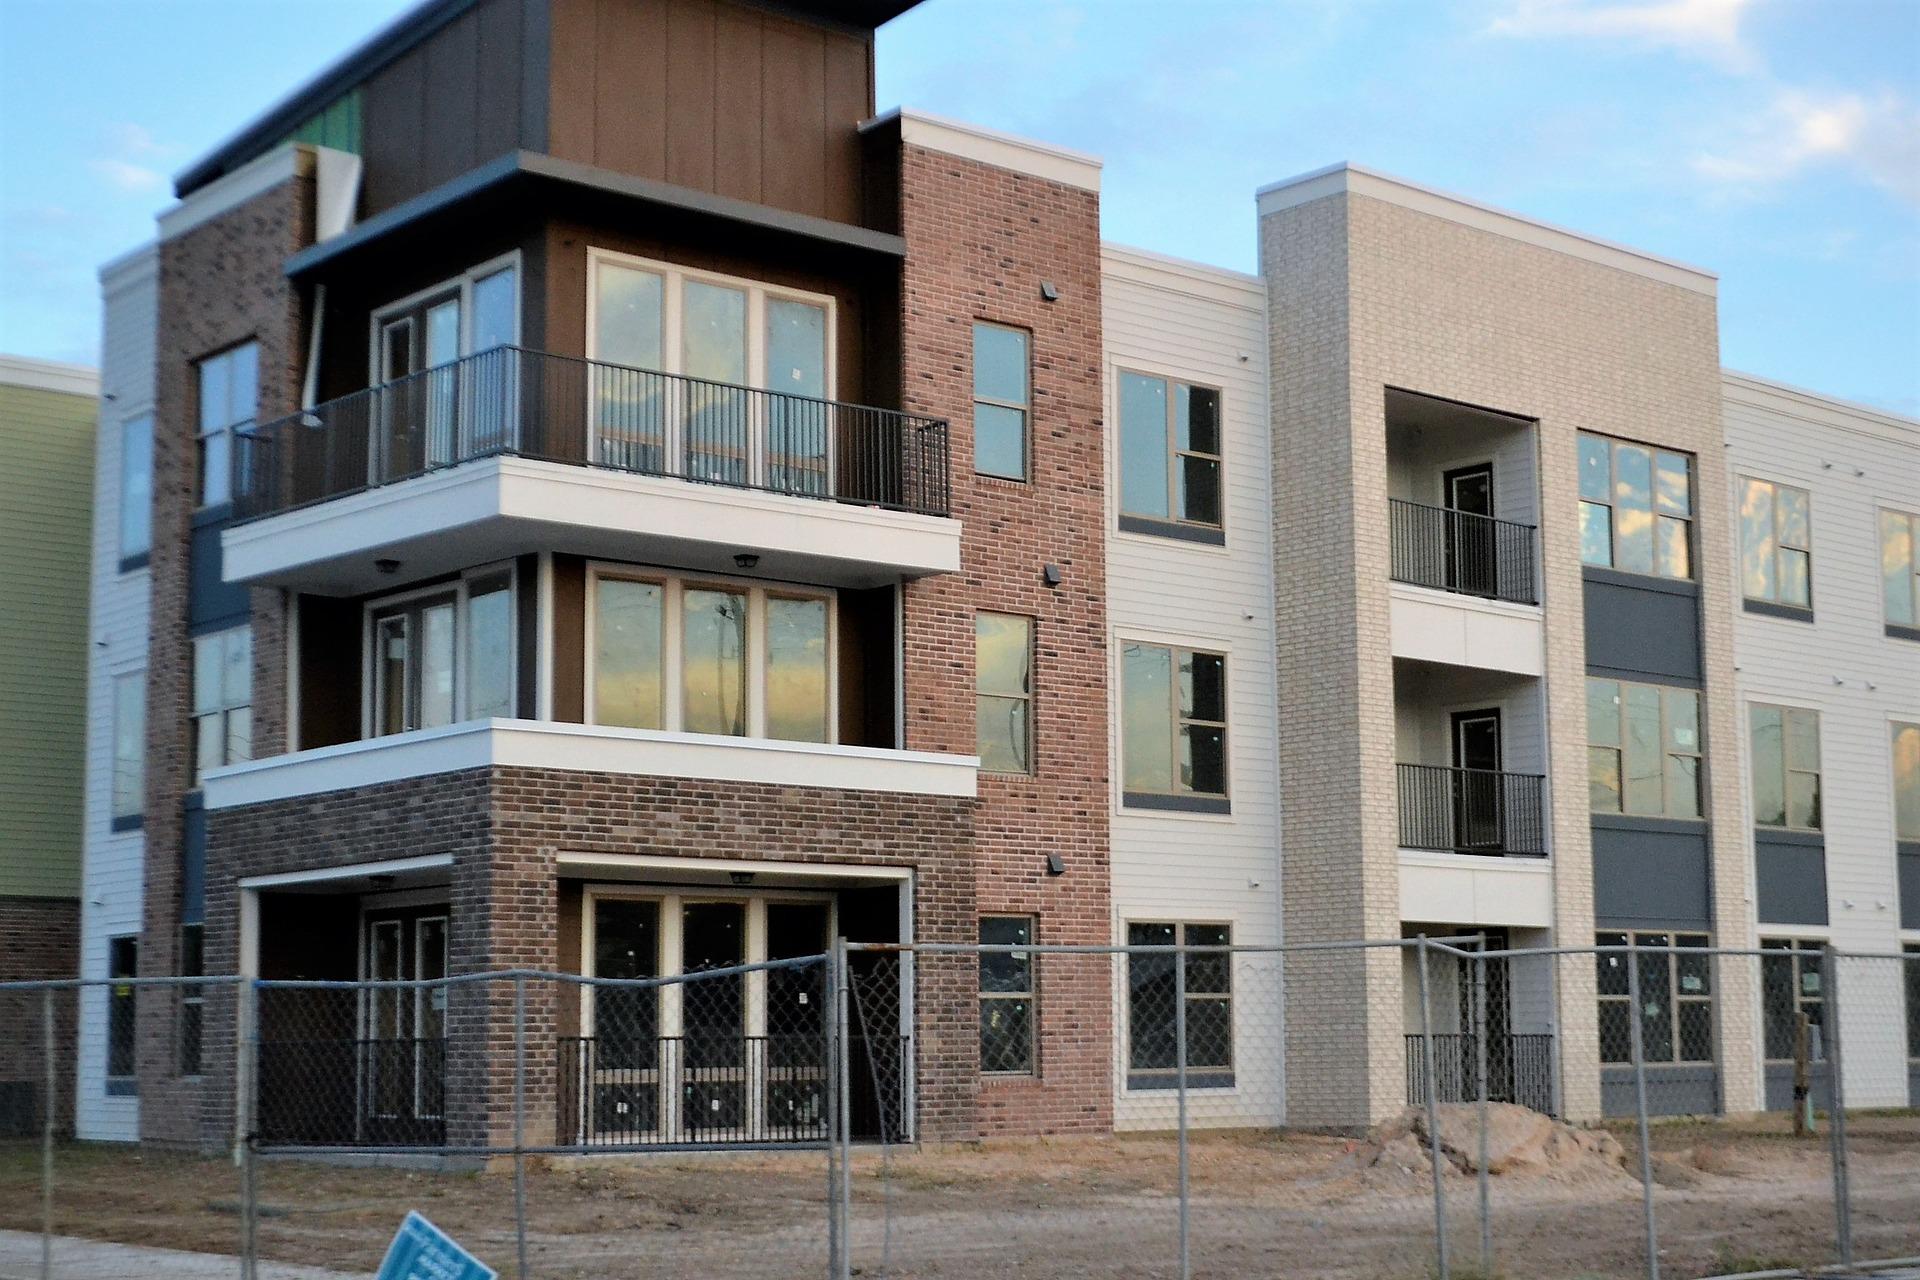 new-housing-development-2821969_1920.jpg